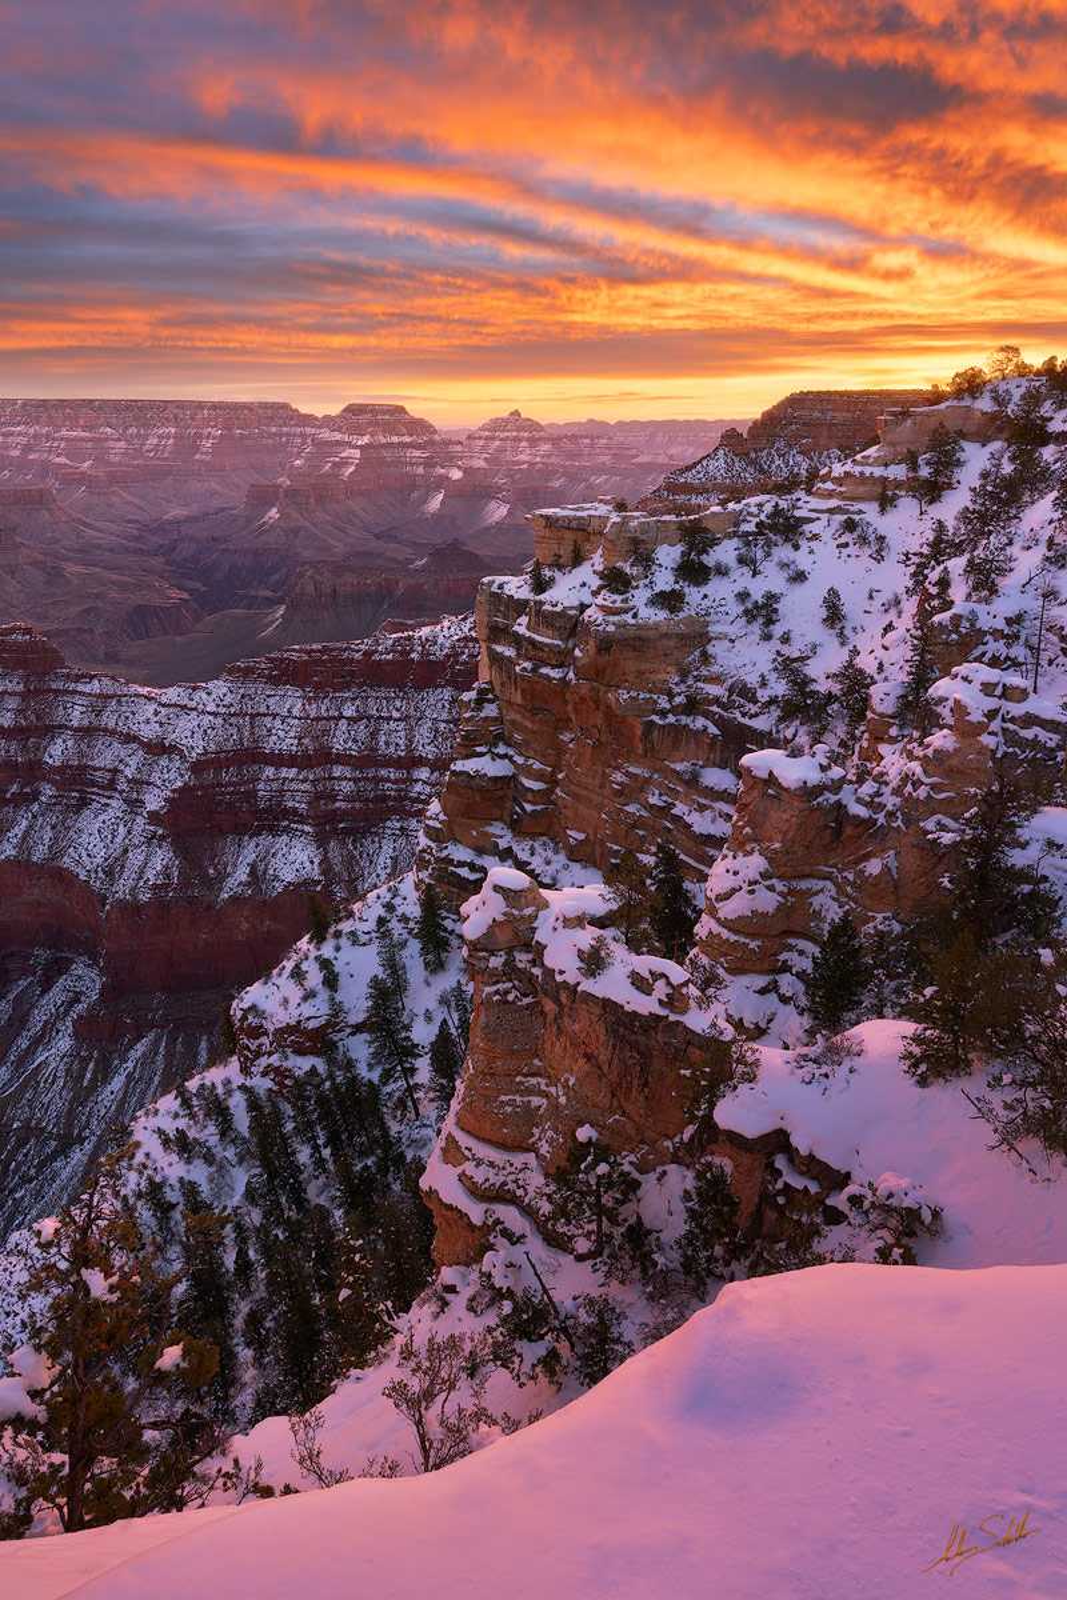 AZ, Arizona, Grand Canyon, Grand Canyon National Park, National Park, Snow, Snow at the Grand Canyon, South Rim, South Rim of the Grand Canyon, Winter, Winter at the Grand Canyon, photo